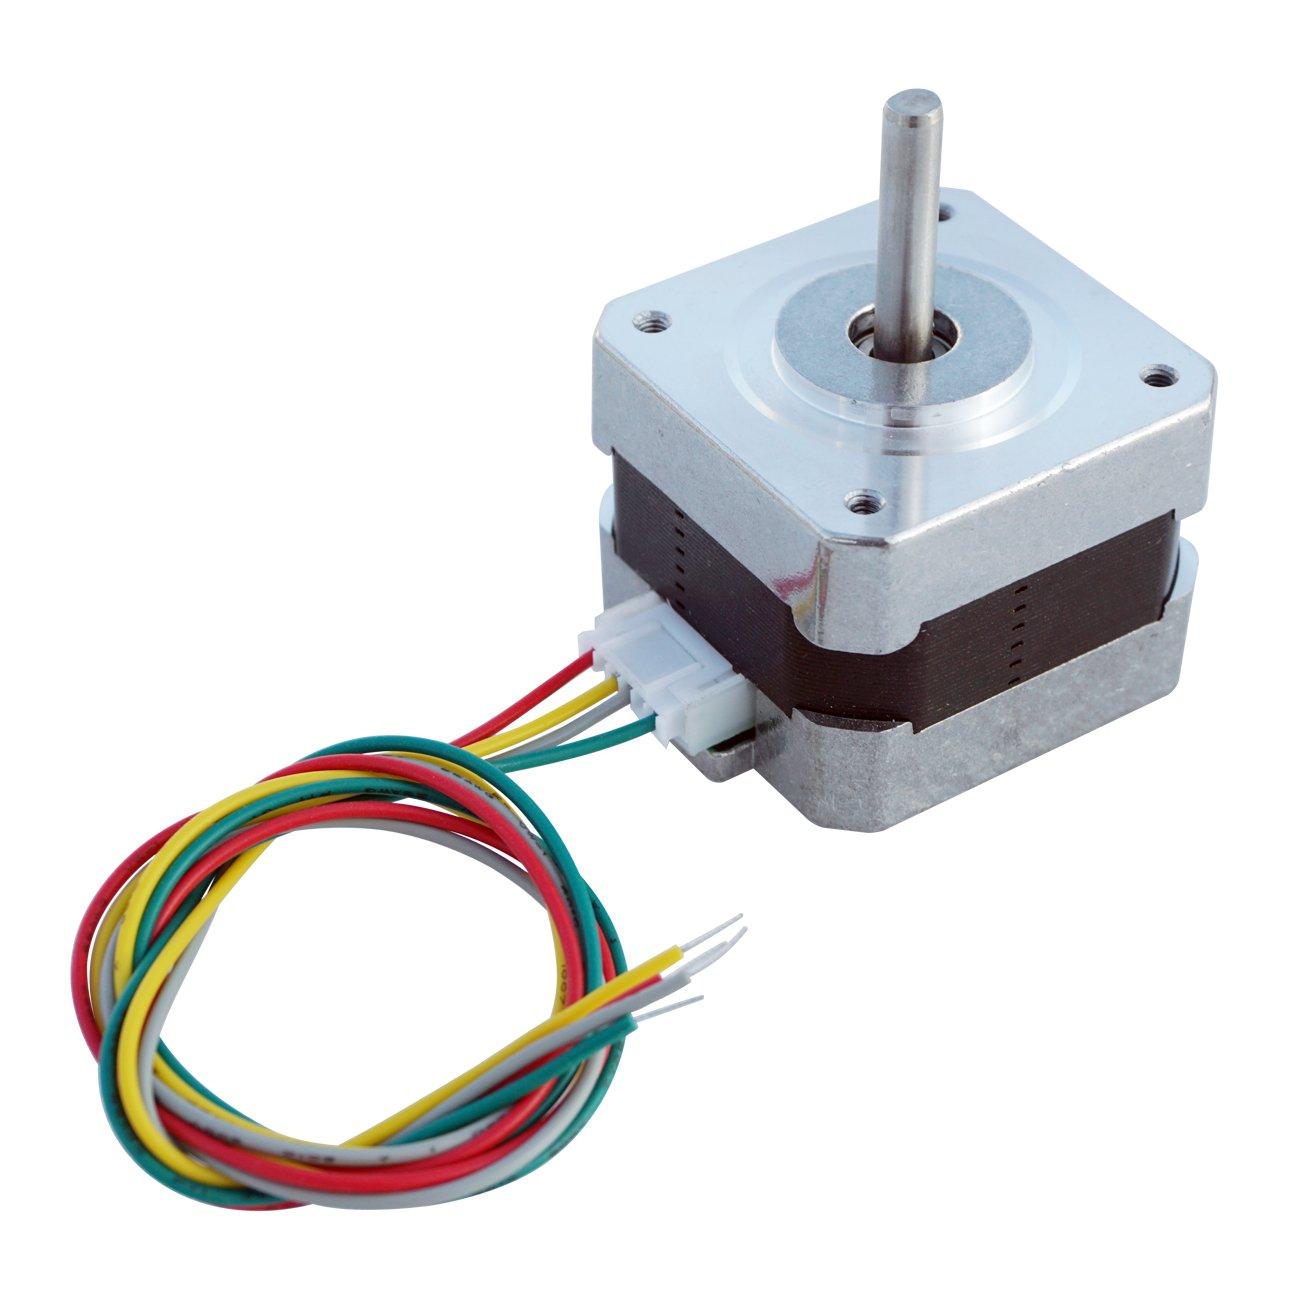 Stepper Motors Nema 17 Kit 12v For Cnc Reprap 3d Printer 4 Wire Motor Wiring Harness 368ozin 04a Beauty